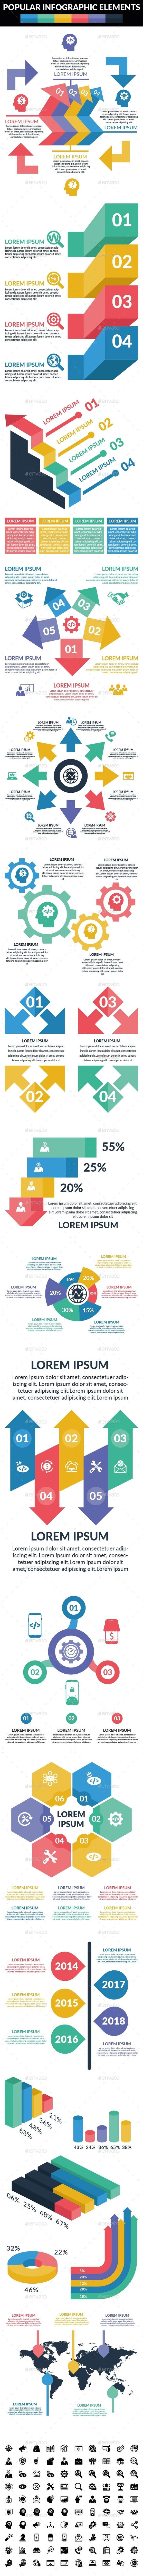 Popular Infographic Elements - Infographics